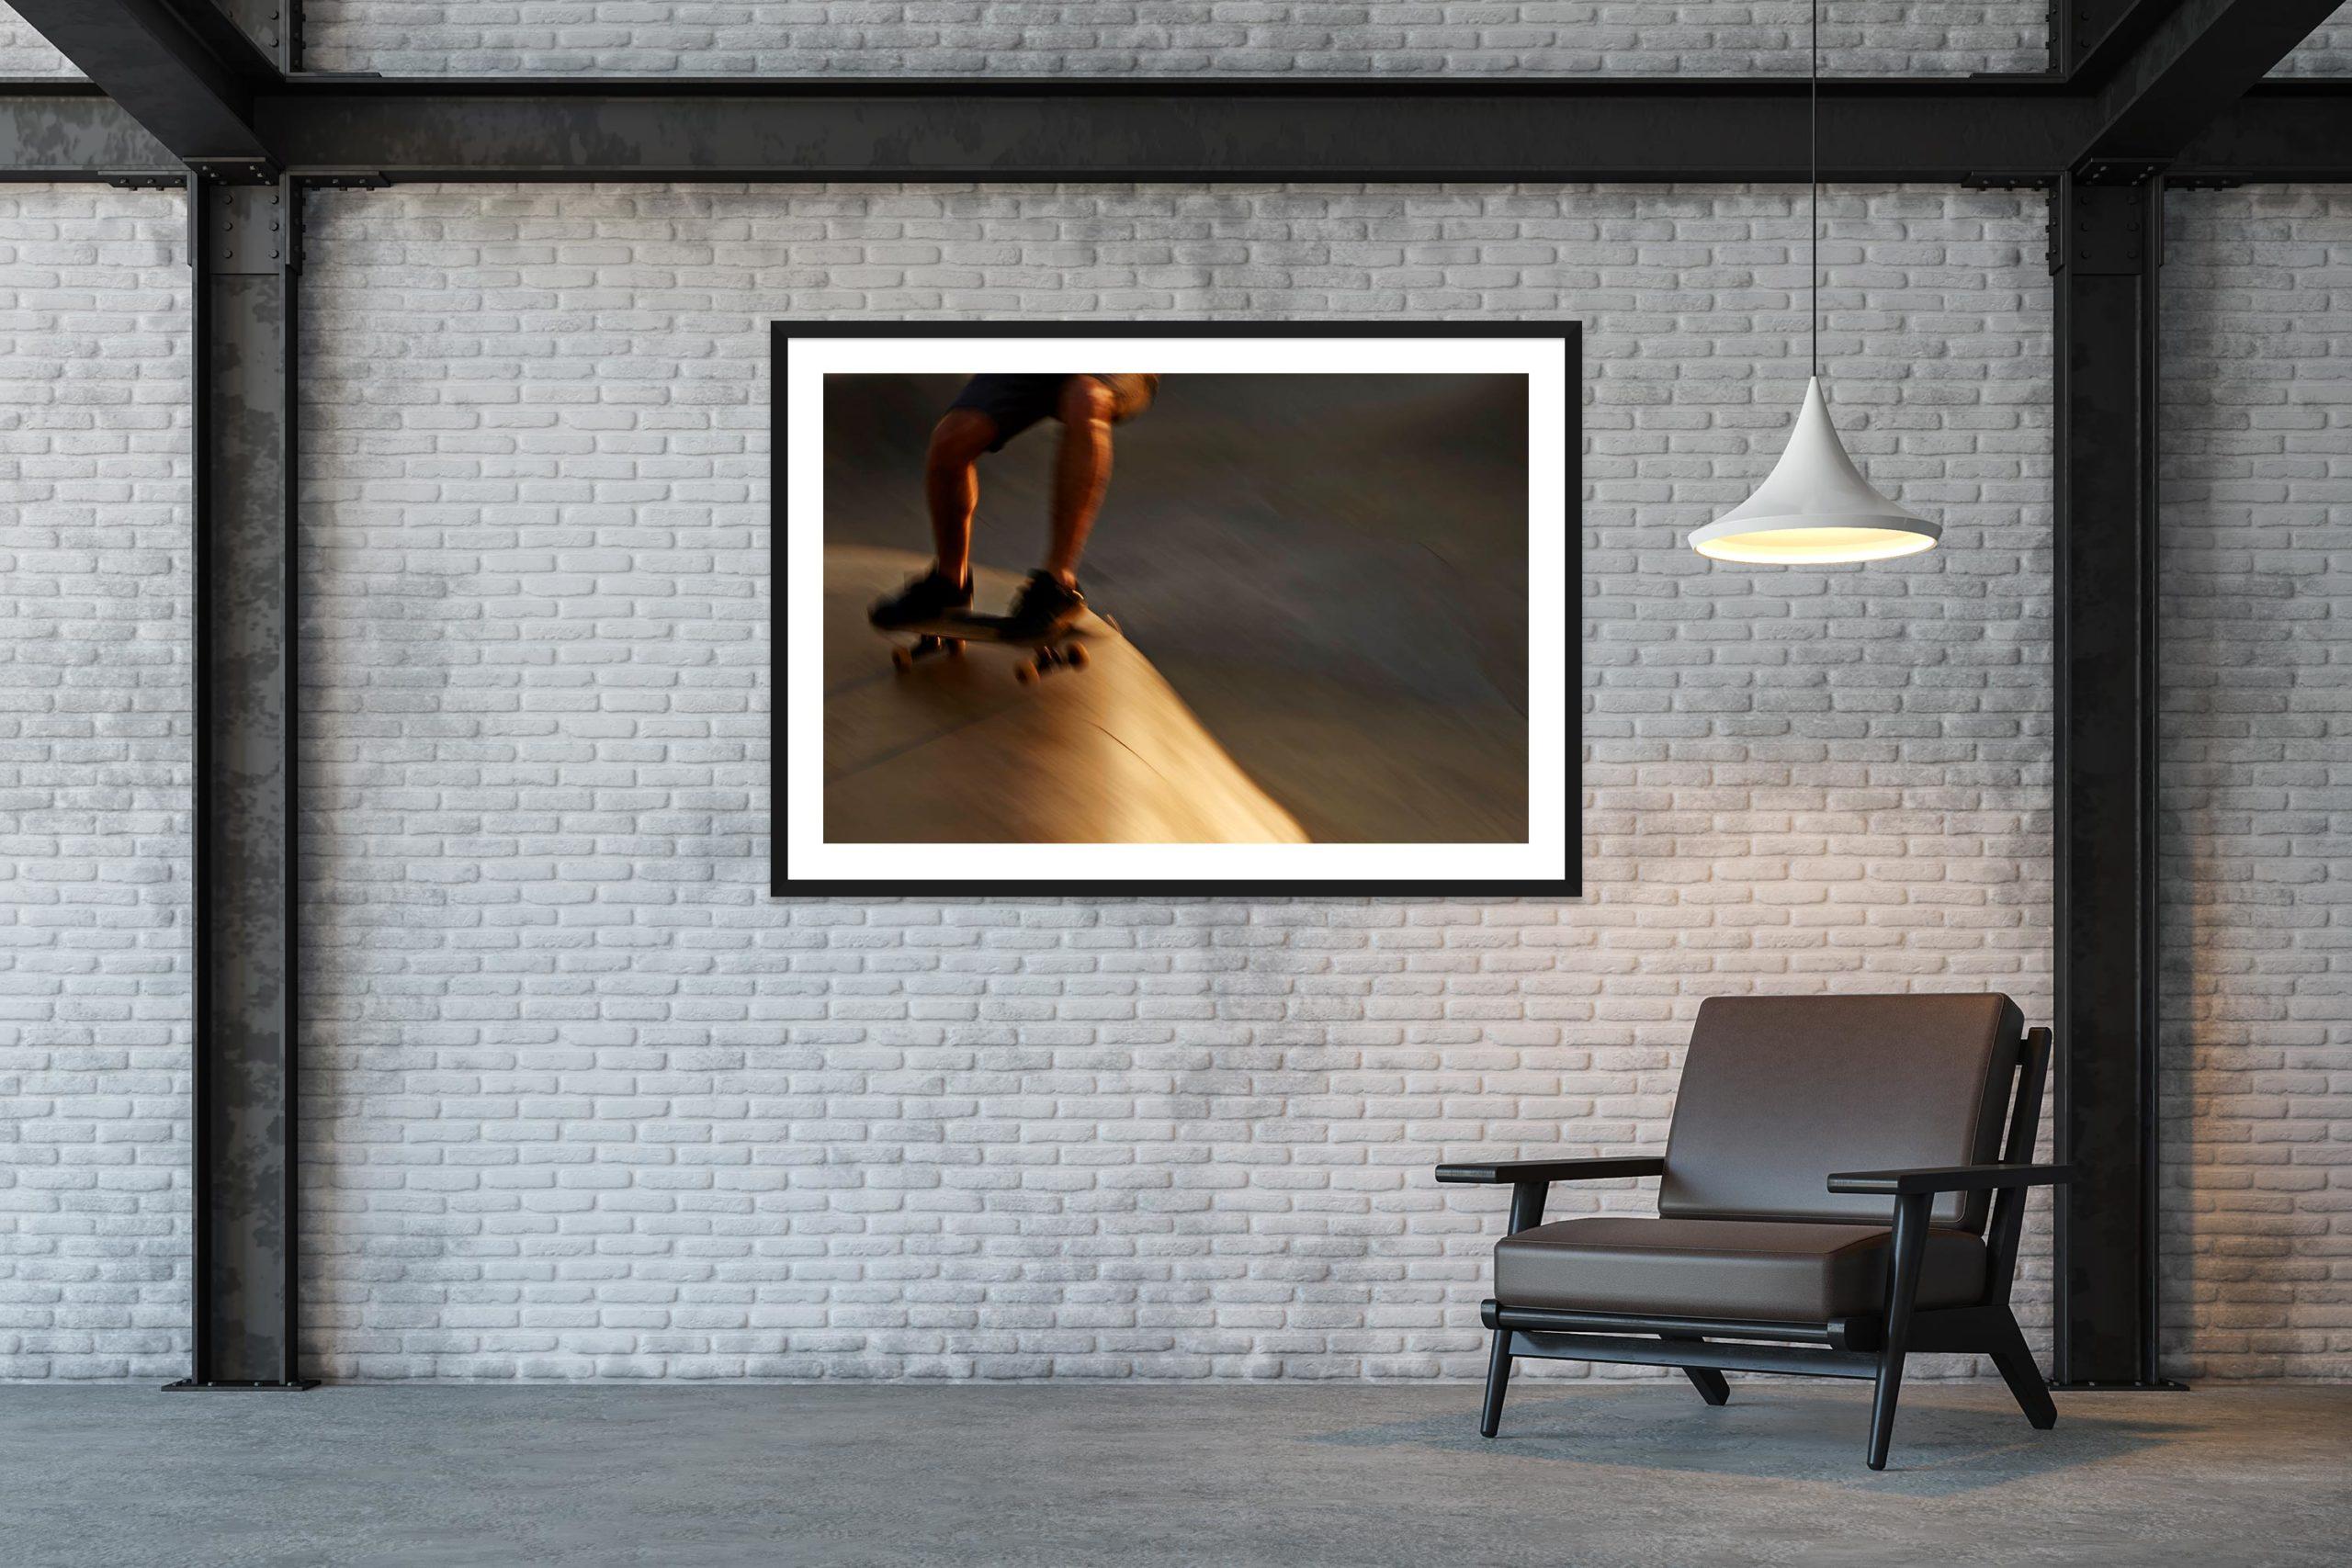 Golden Blur 2 - Black Frame - Skate Park, Venice Beach Collection - Fine Art Photography by Toby Dixon